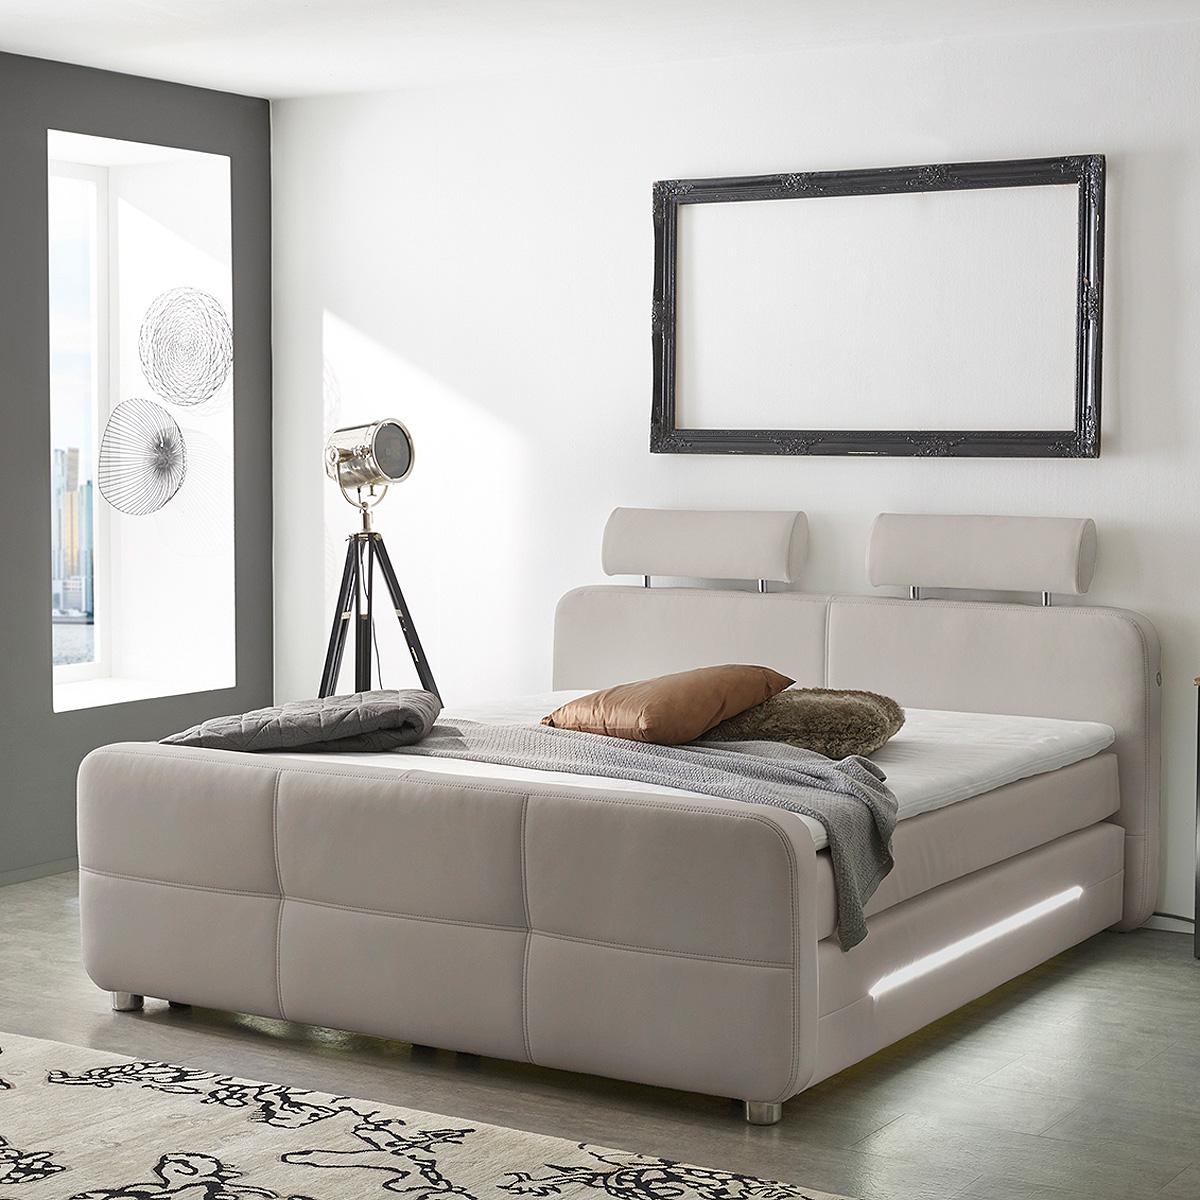 boxspringbett gina schwarz grau greige wei dunkelgrau mit. Black Bedroom Furniture Sets. Home Design Ideas